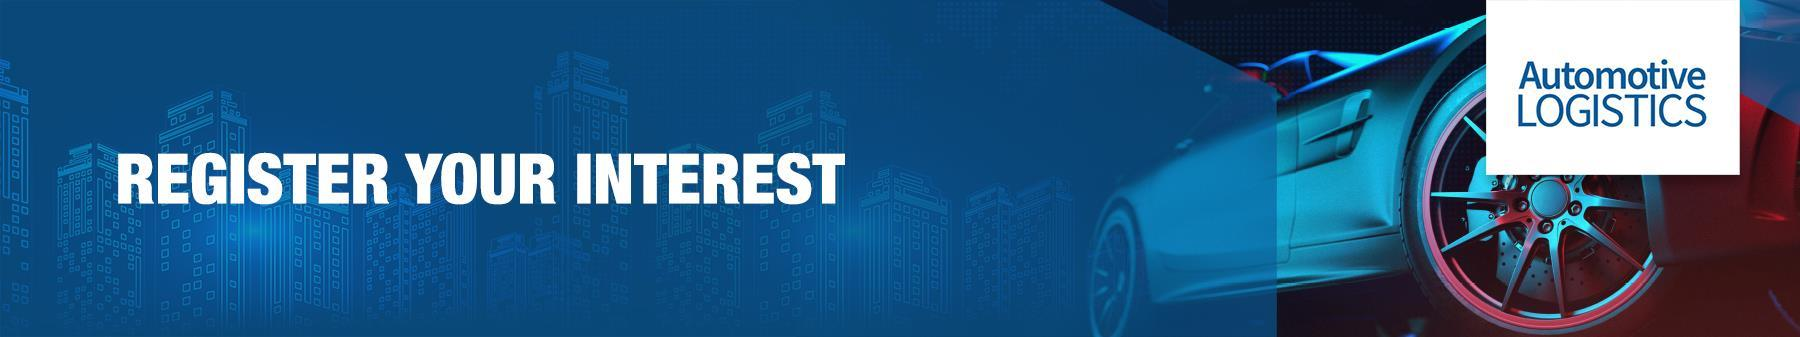 782-al-conference-web-register-v12-230720-300dpi copy